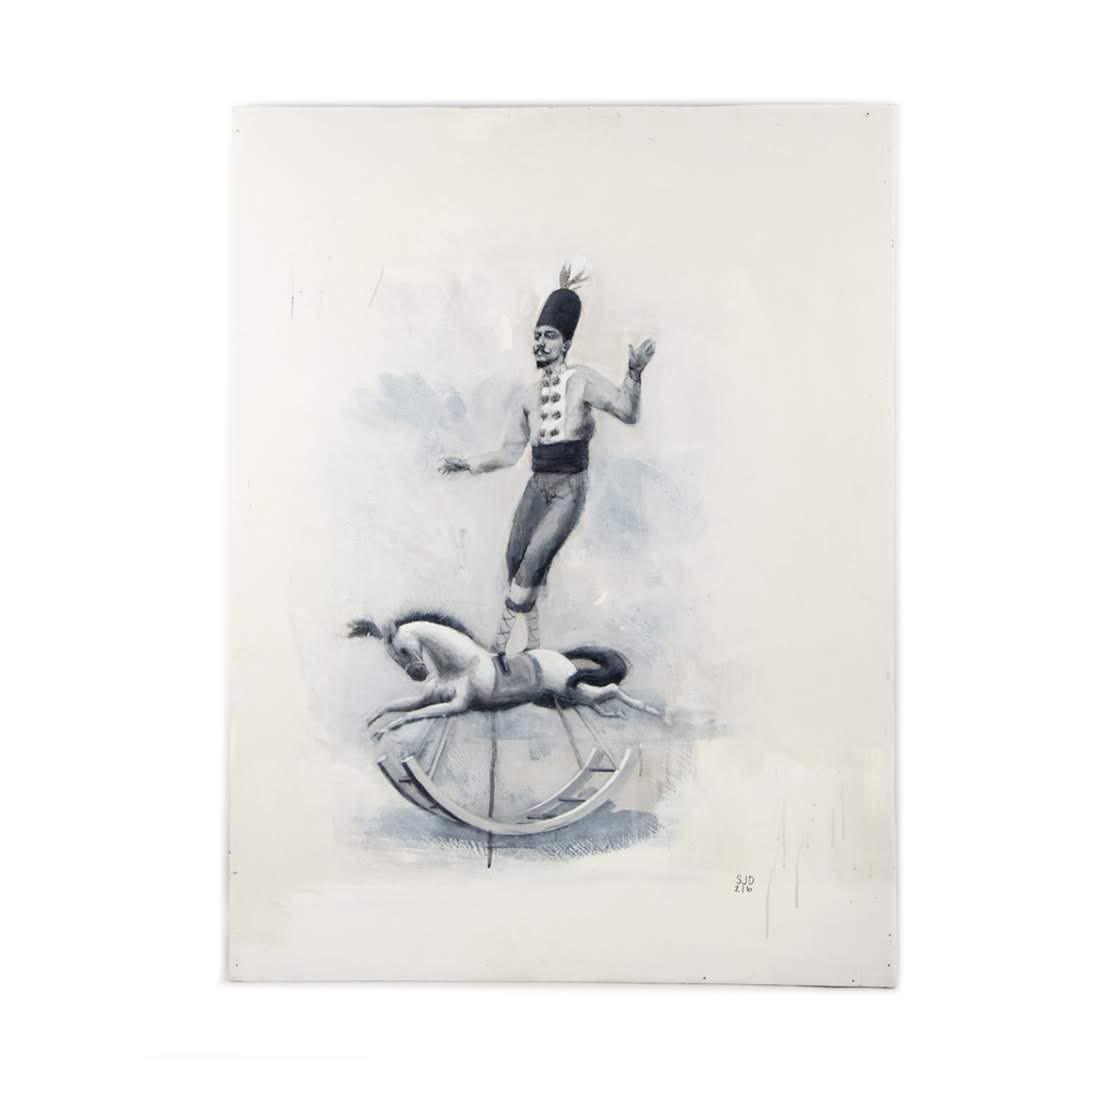 Original Acryclic on Board The Rider by Scott J Dupree